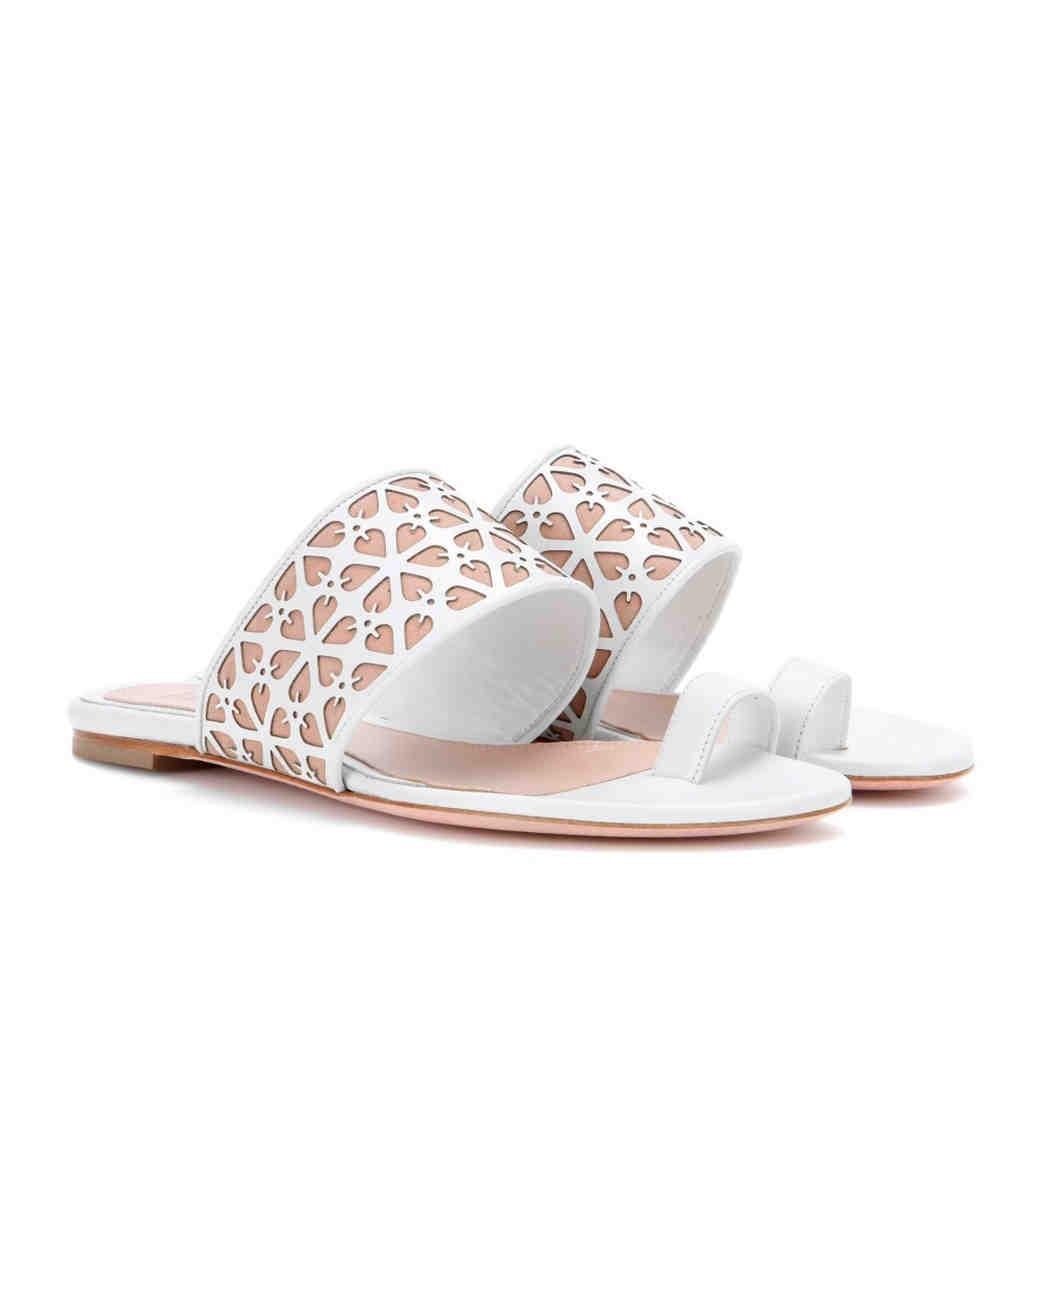 summer-wedding-shoes-alexander-mcqueen-leather-sandals-0515.jpg